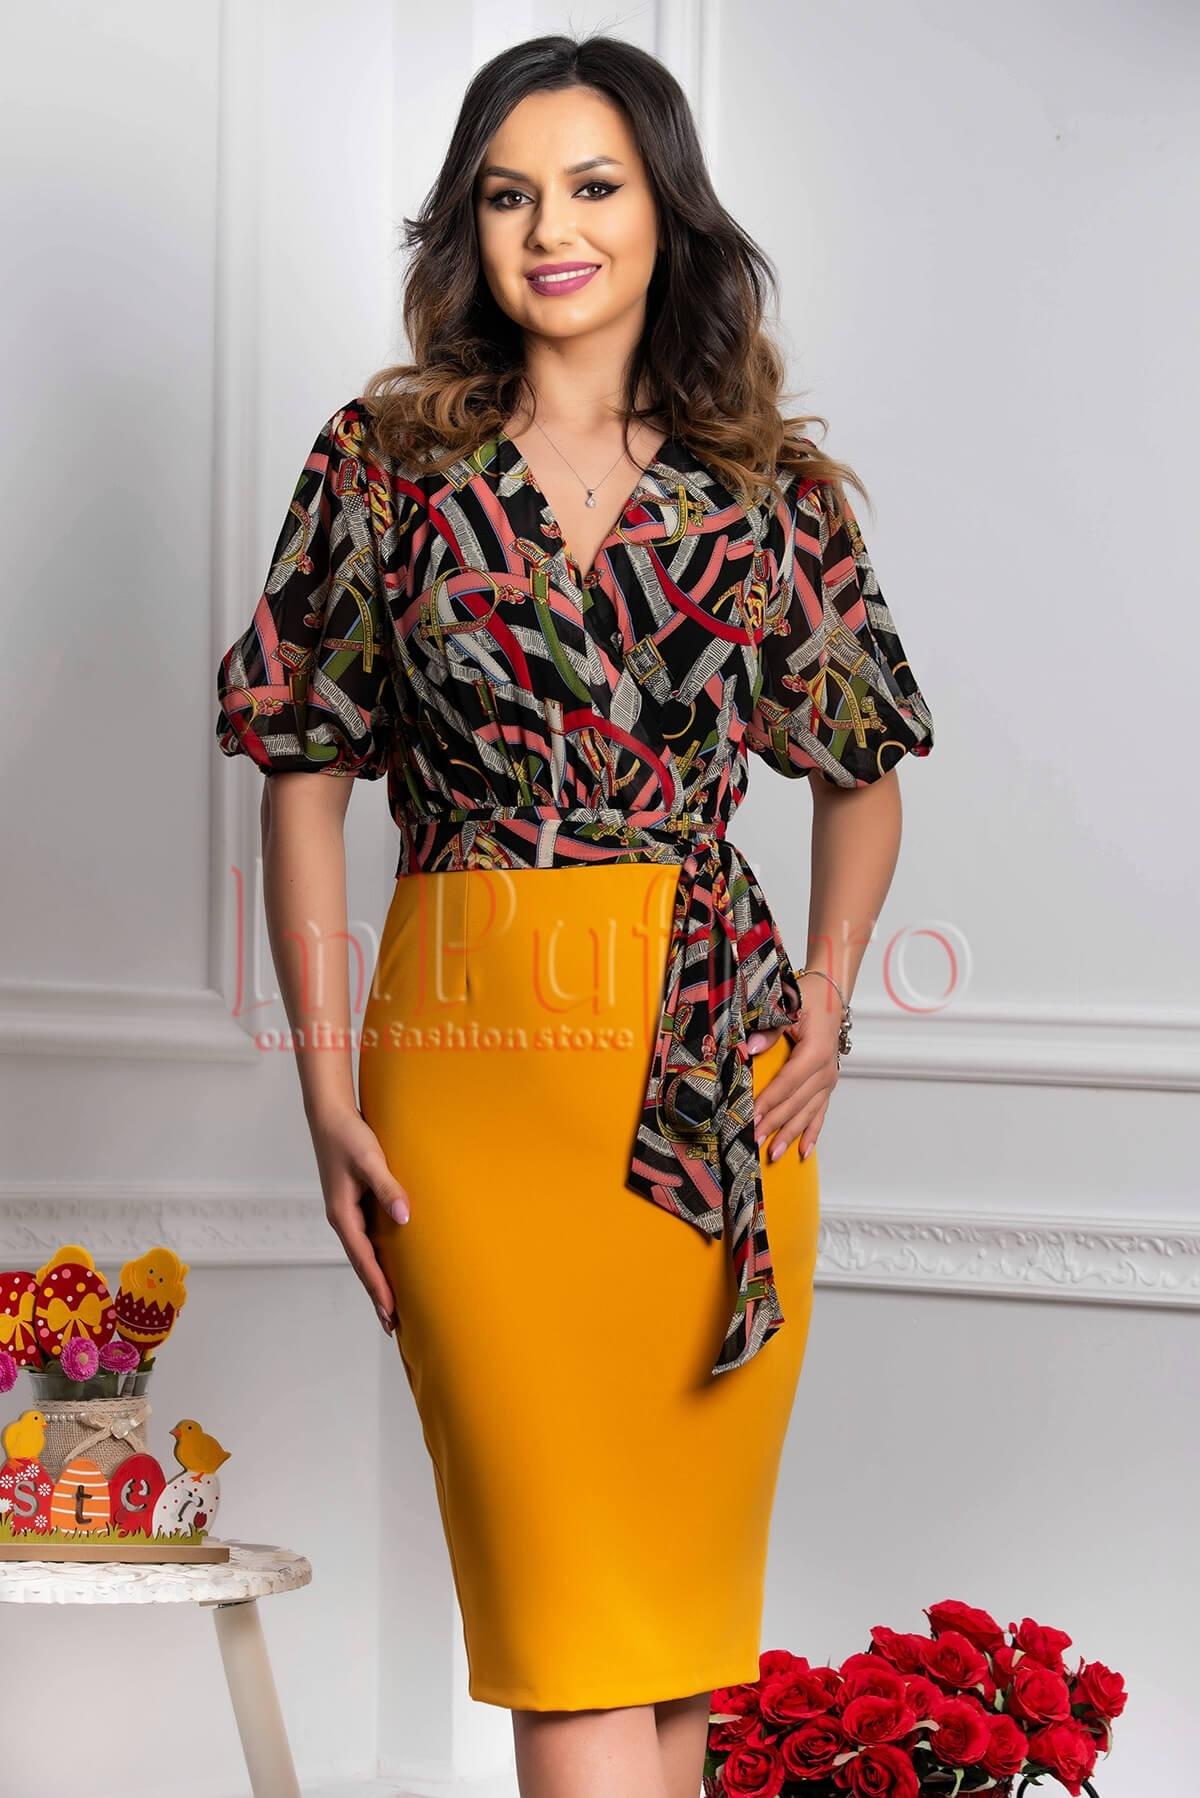 Rochie eleganta galben mustar si imprimeu multicolor cu maneca scurta